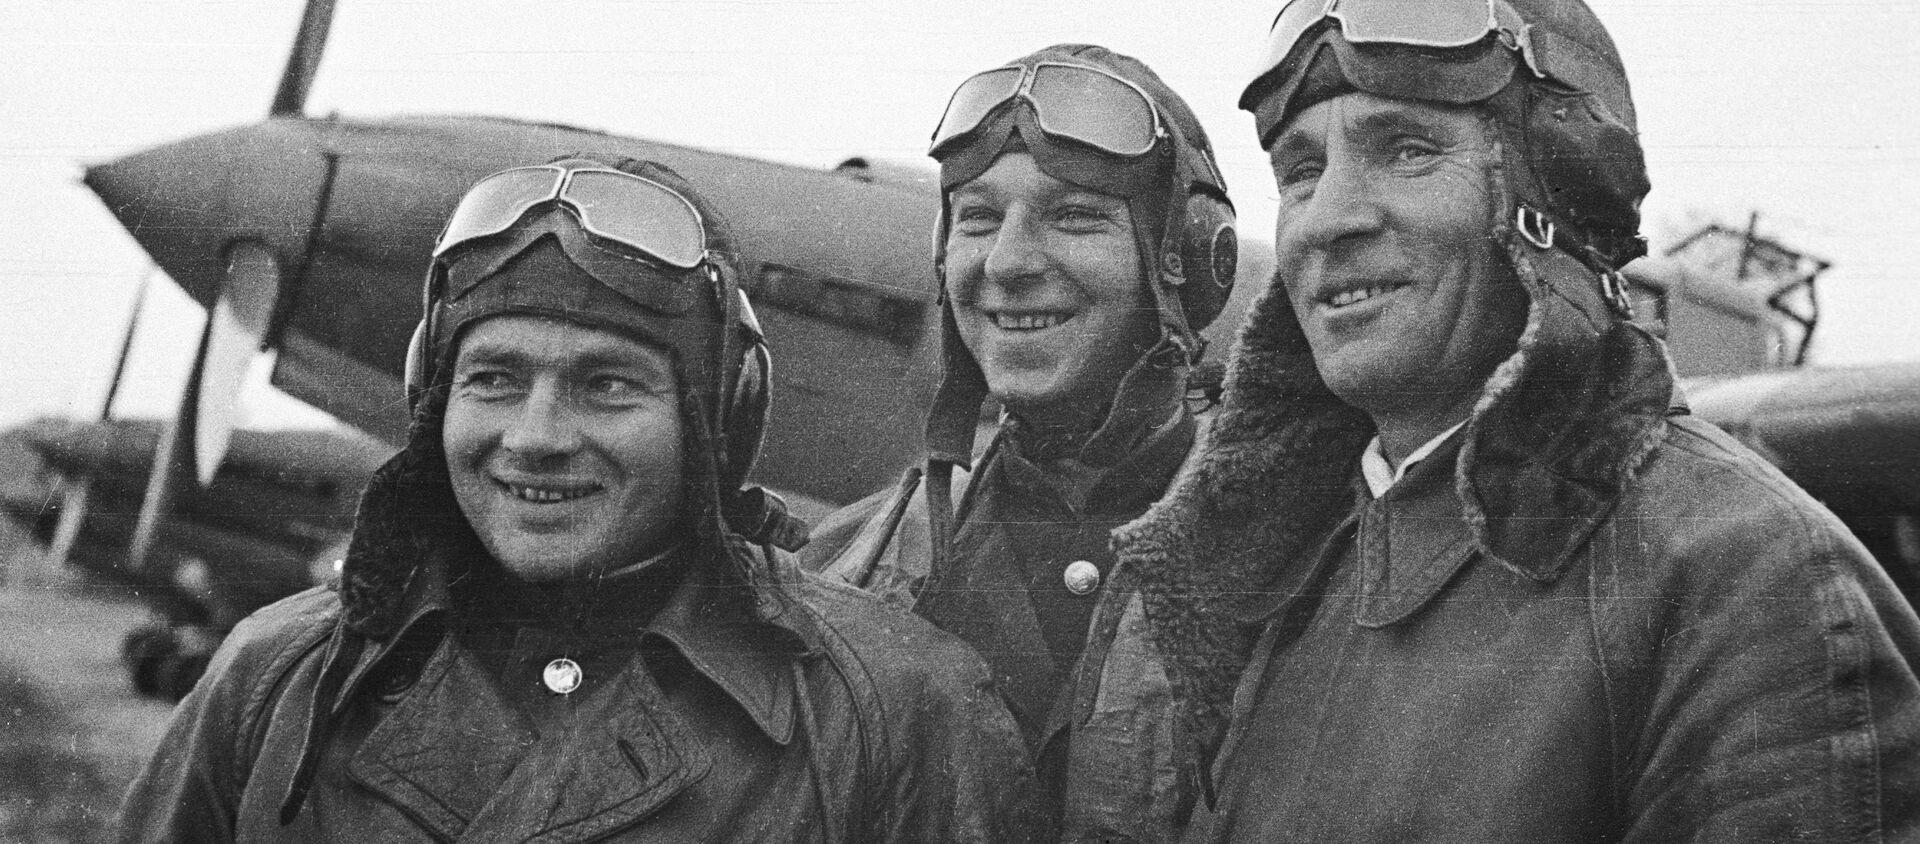 Aviadores soviéticos que participaron en la liberación de Corea - Sputnik Mundo, 1920, 25.12.2019